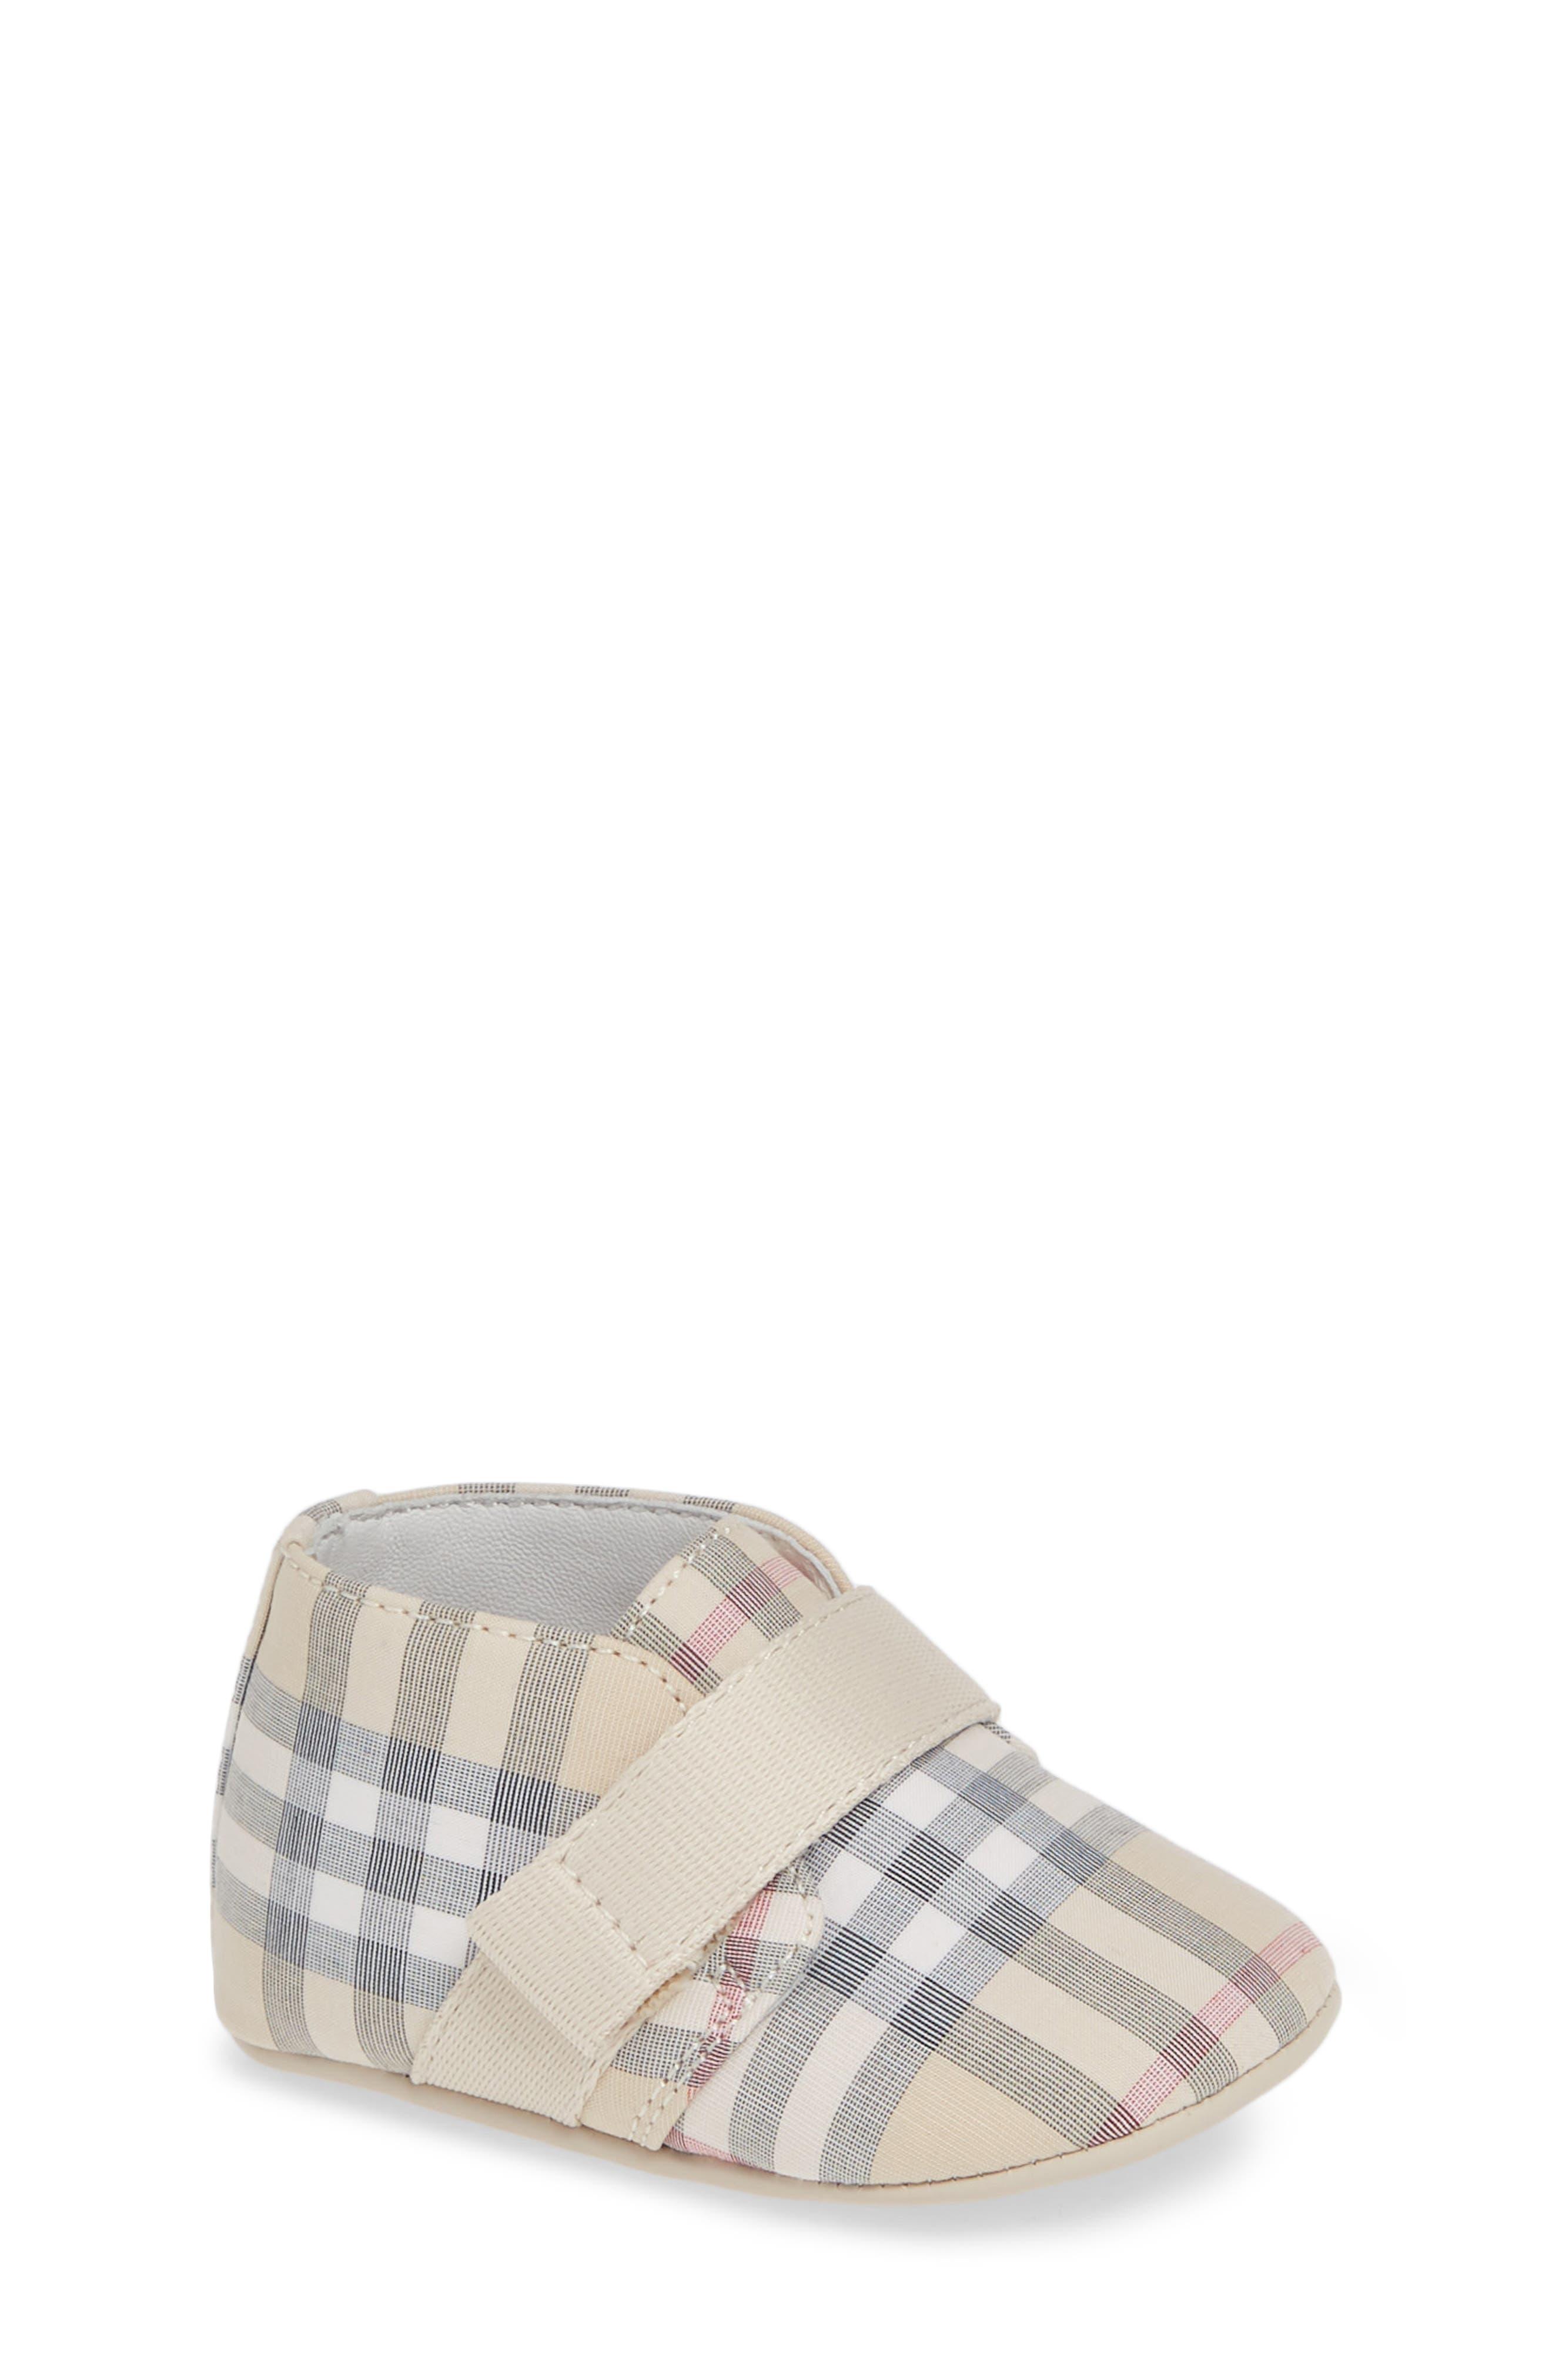 Charlton Check Crib Shoe,                         Main,                         color, PALE STONE